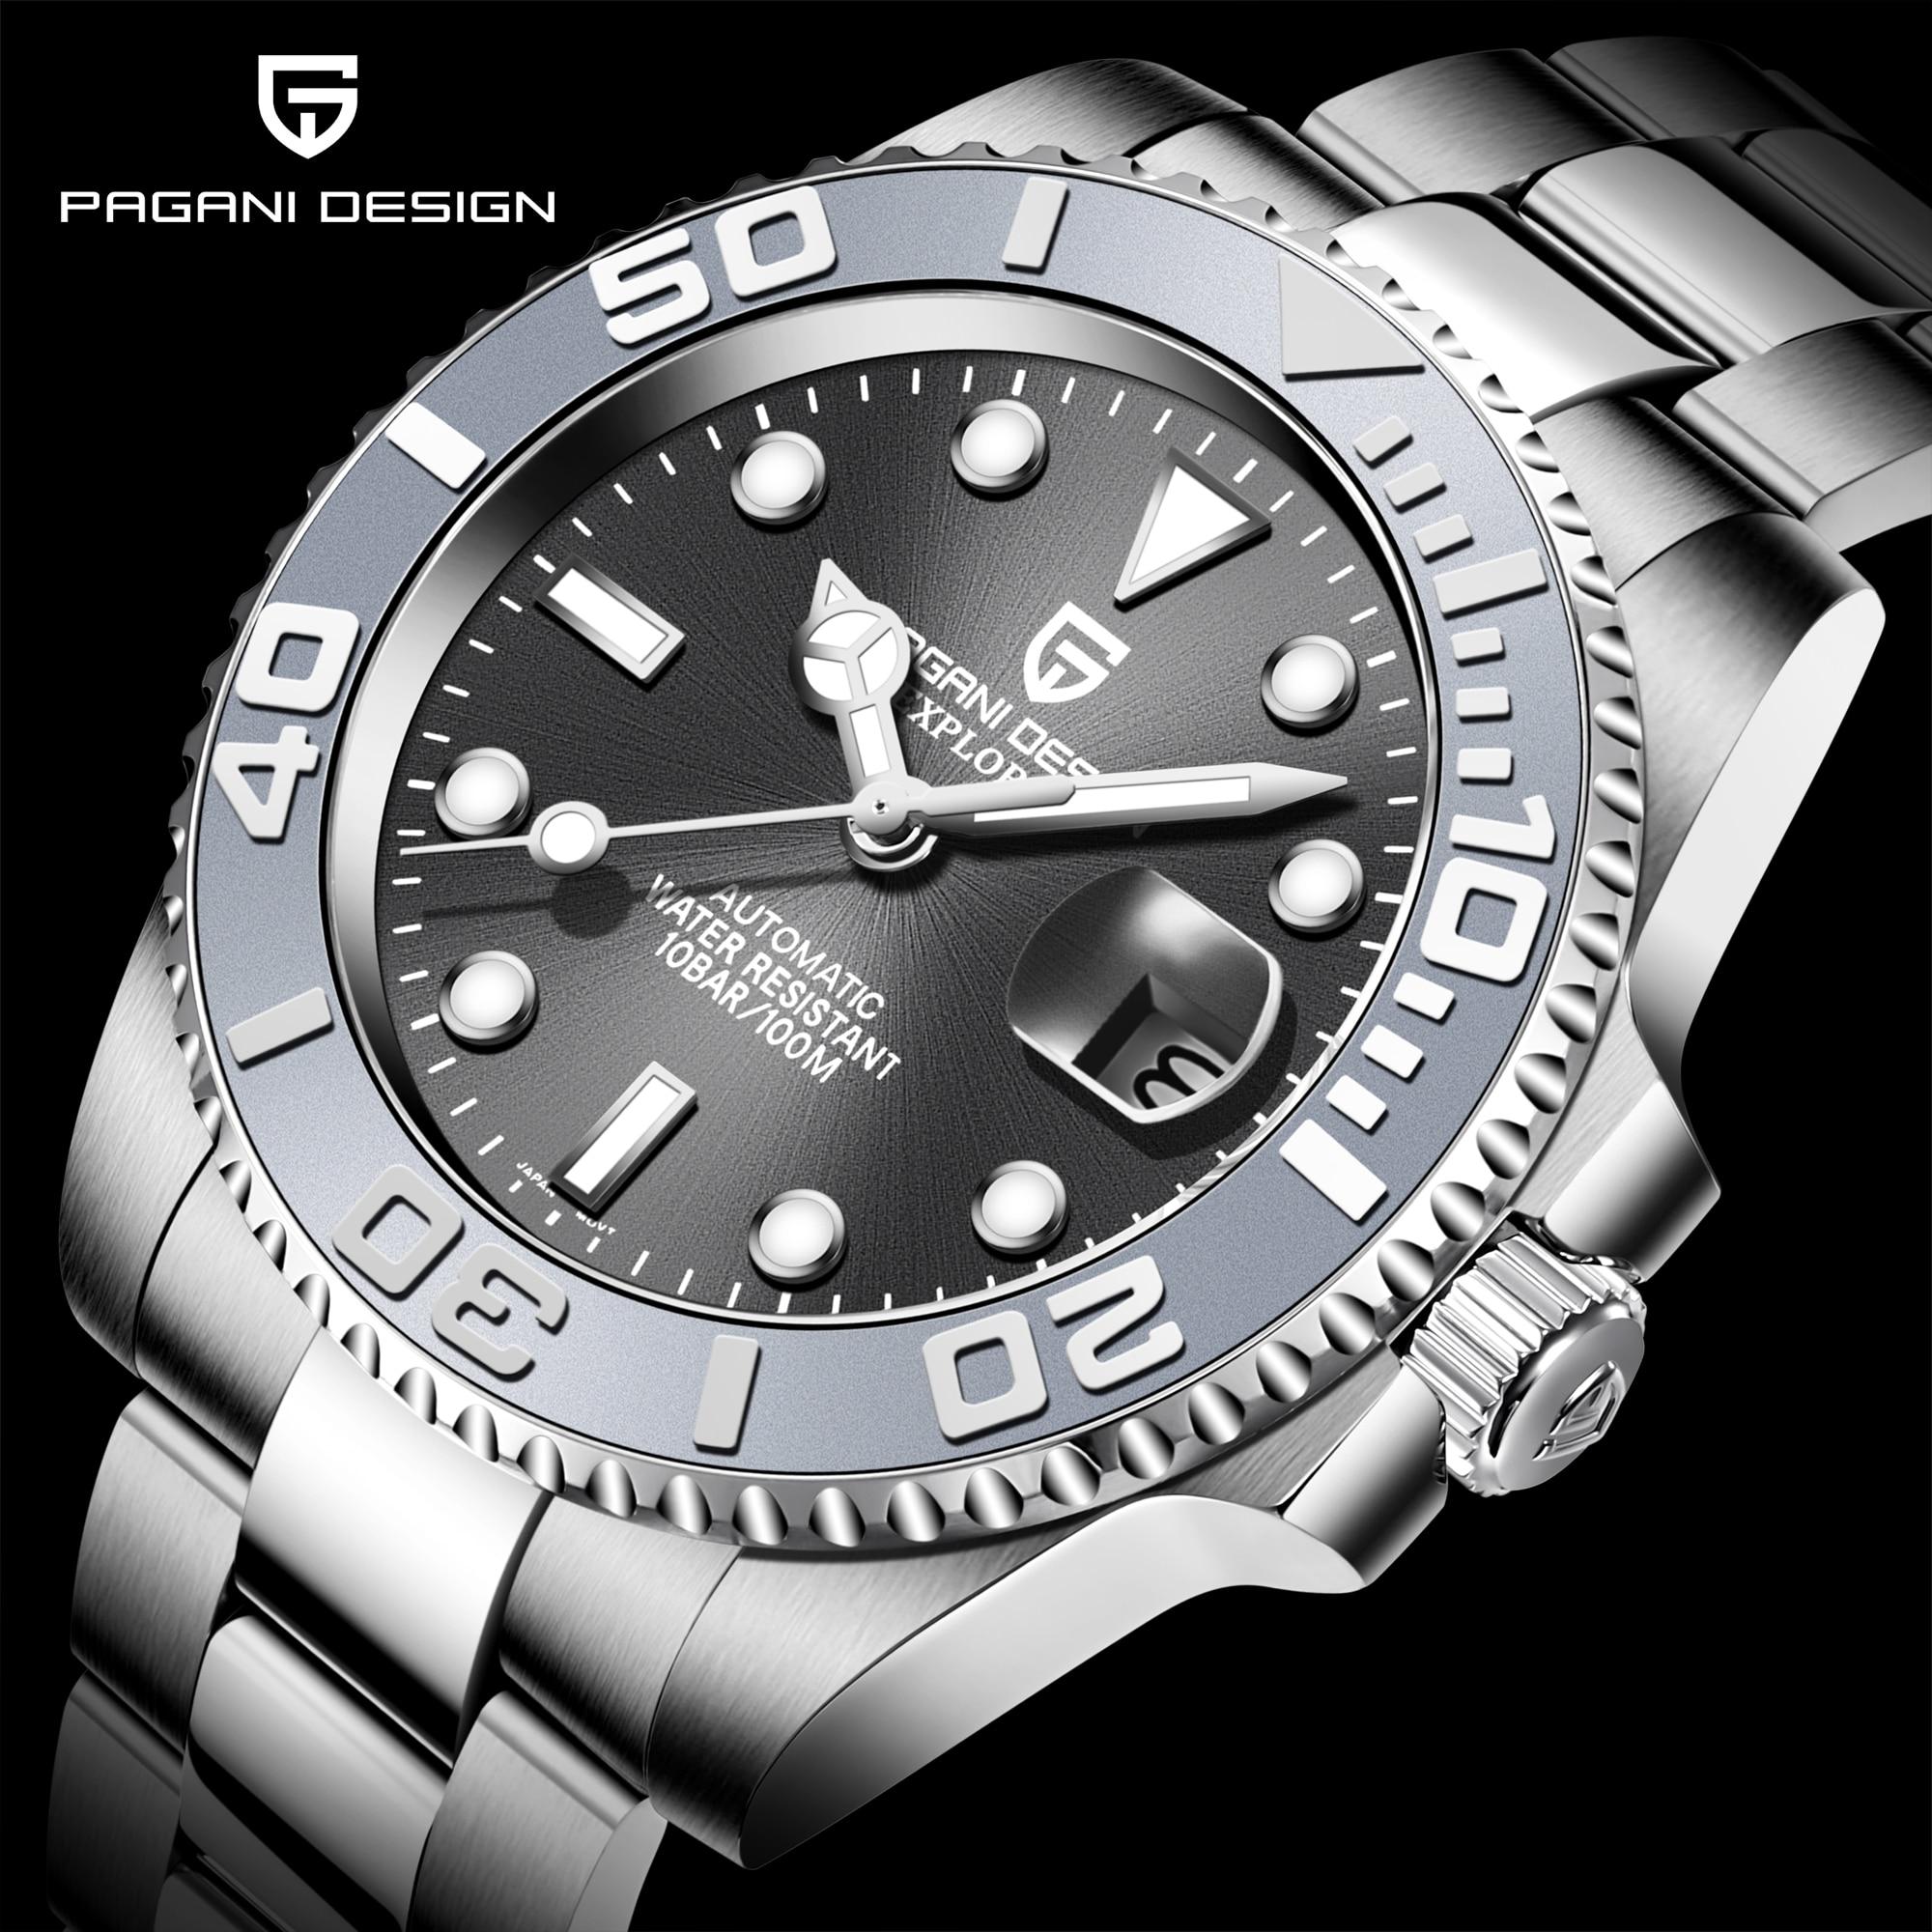 PAGANI Design-ساعة رجالية أوتوماتيكية من الياقوت ، ساعة يد ميكانيكية فاخرة من الفولاذ المقاوم للصدأ ، مقاومة للماء ، Mekaniska klockor